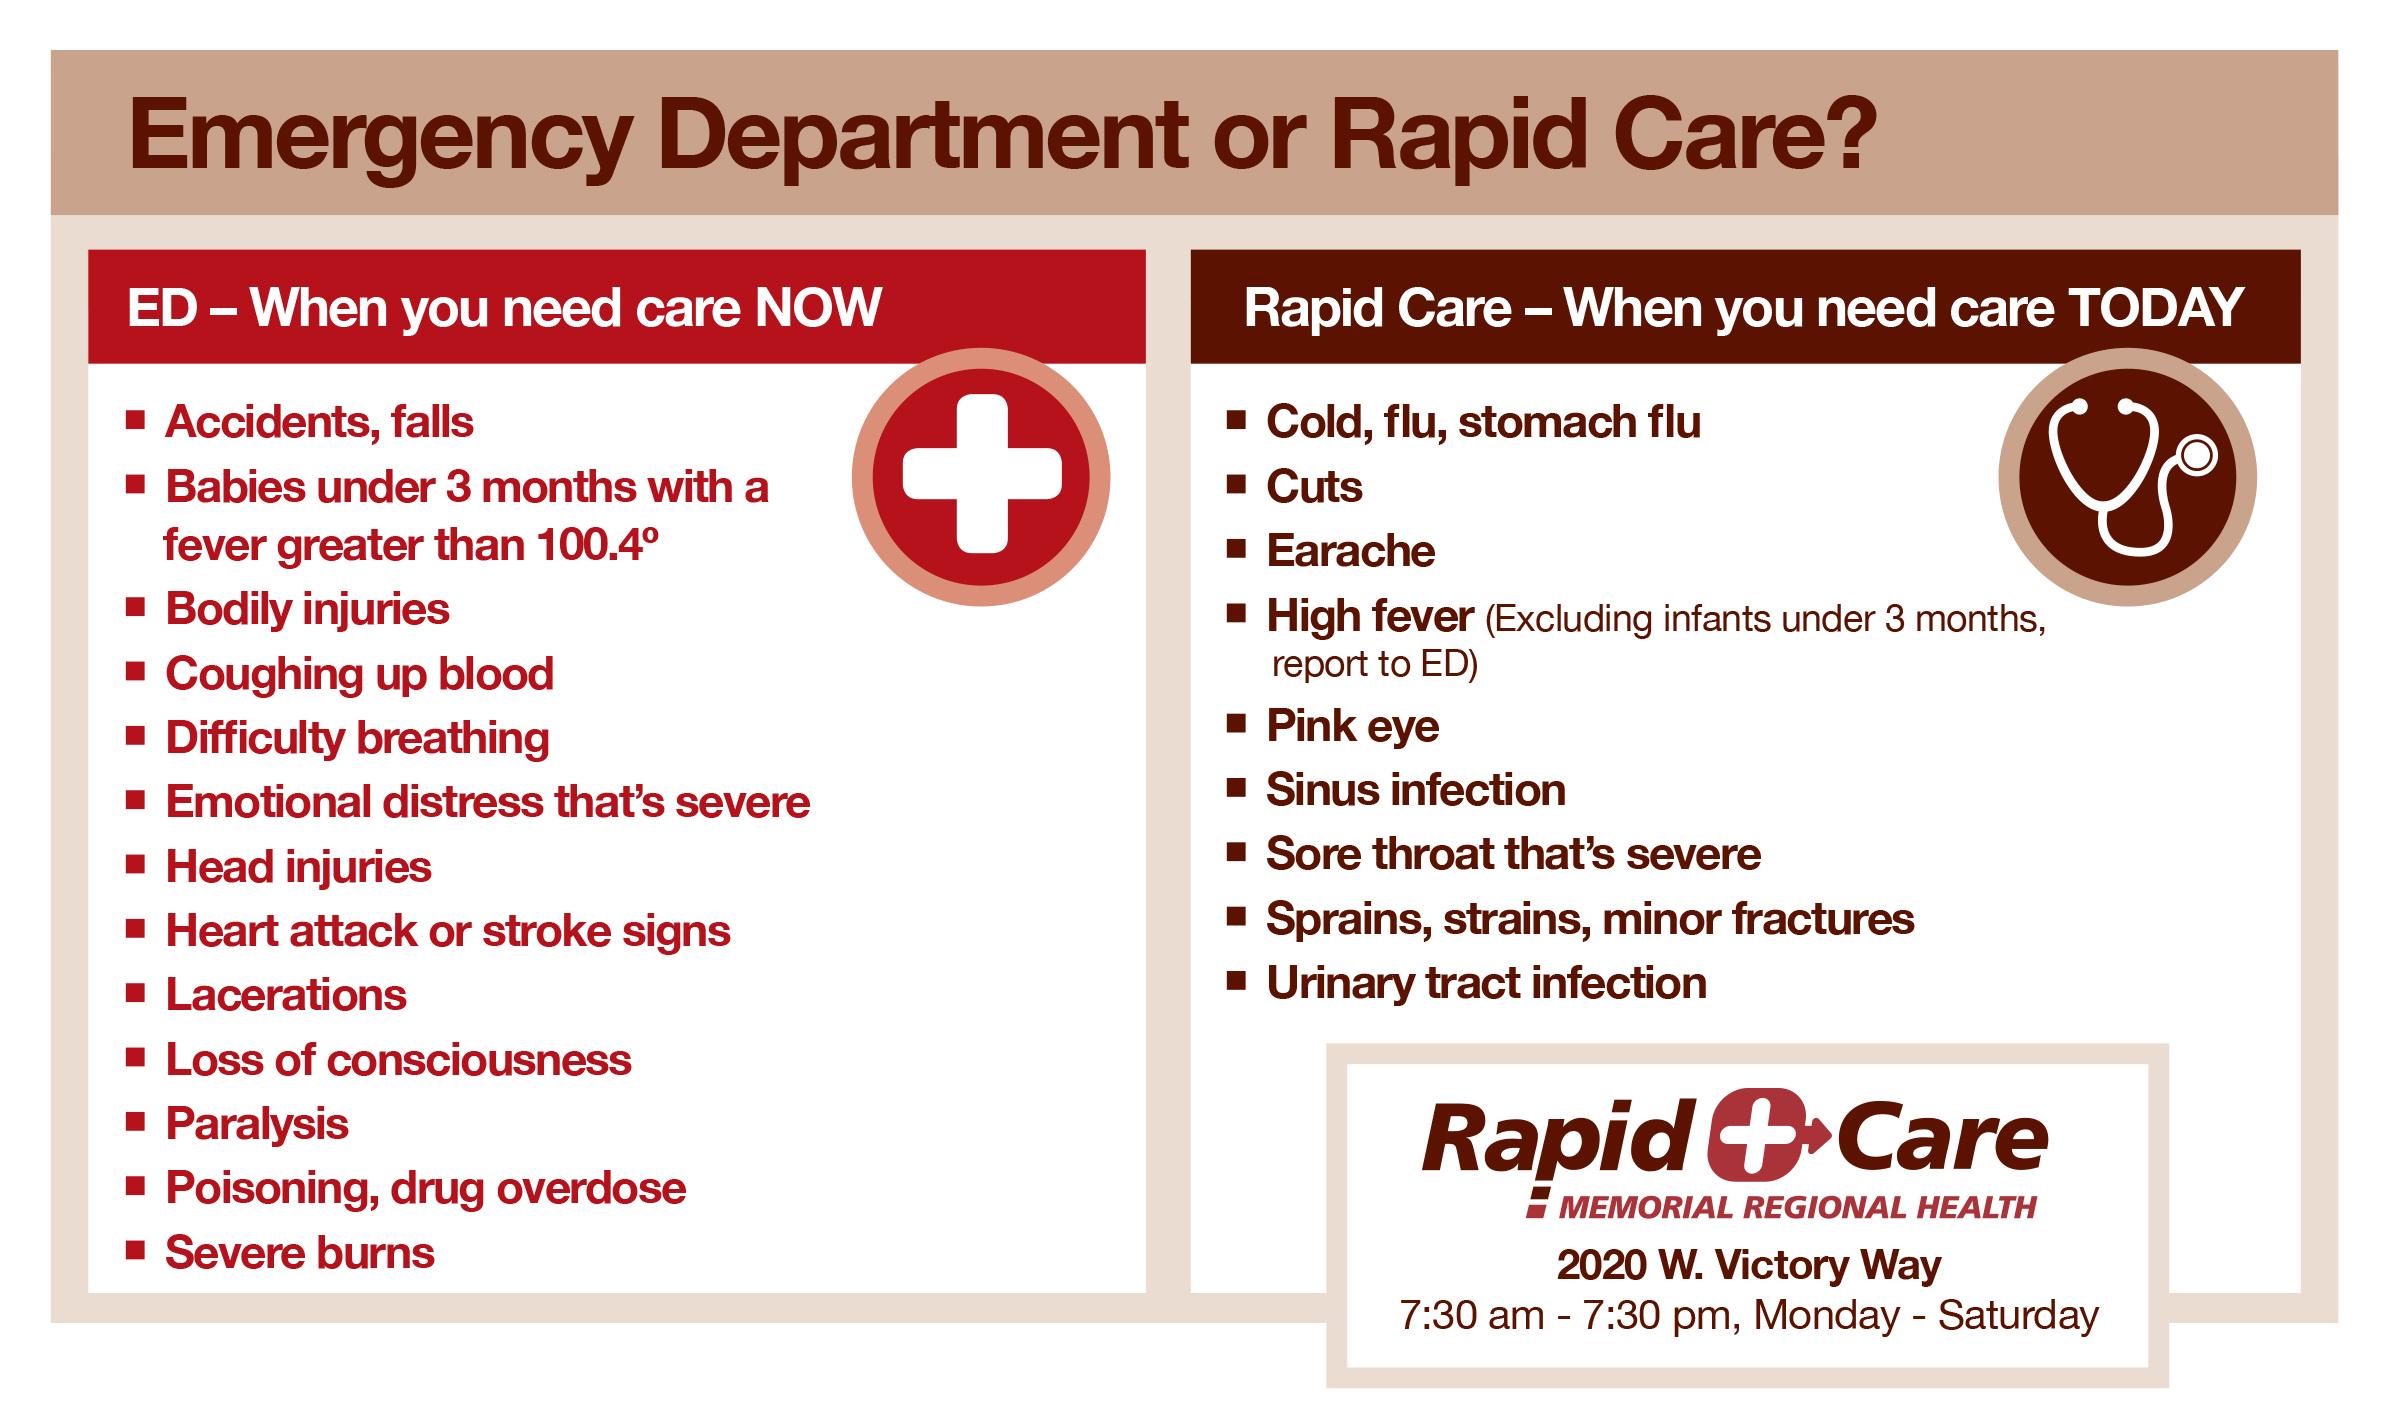 ED_RapidCare - Memorial Regional Health